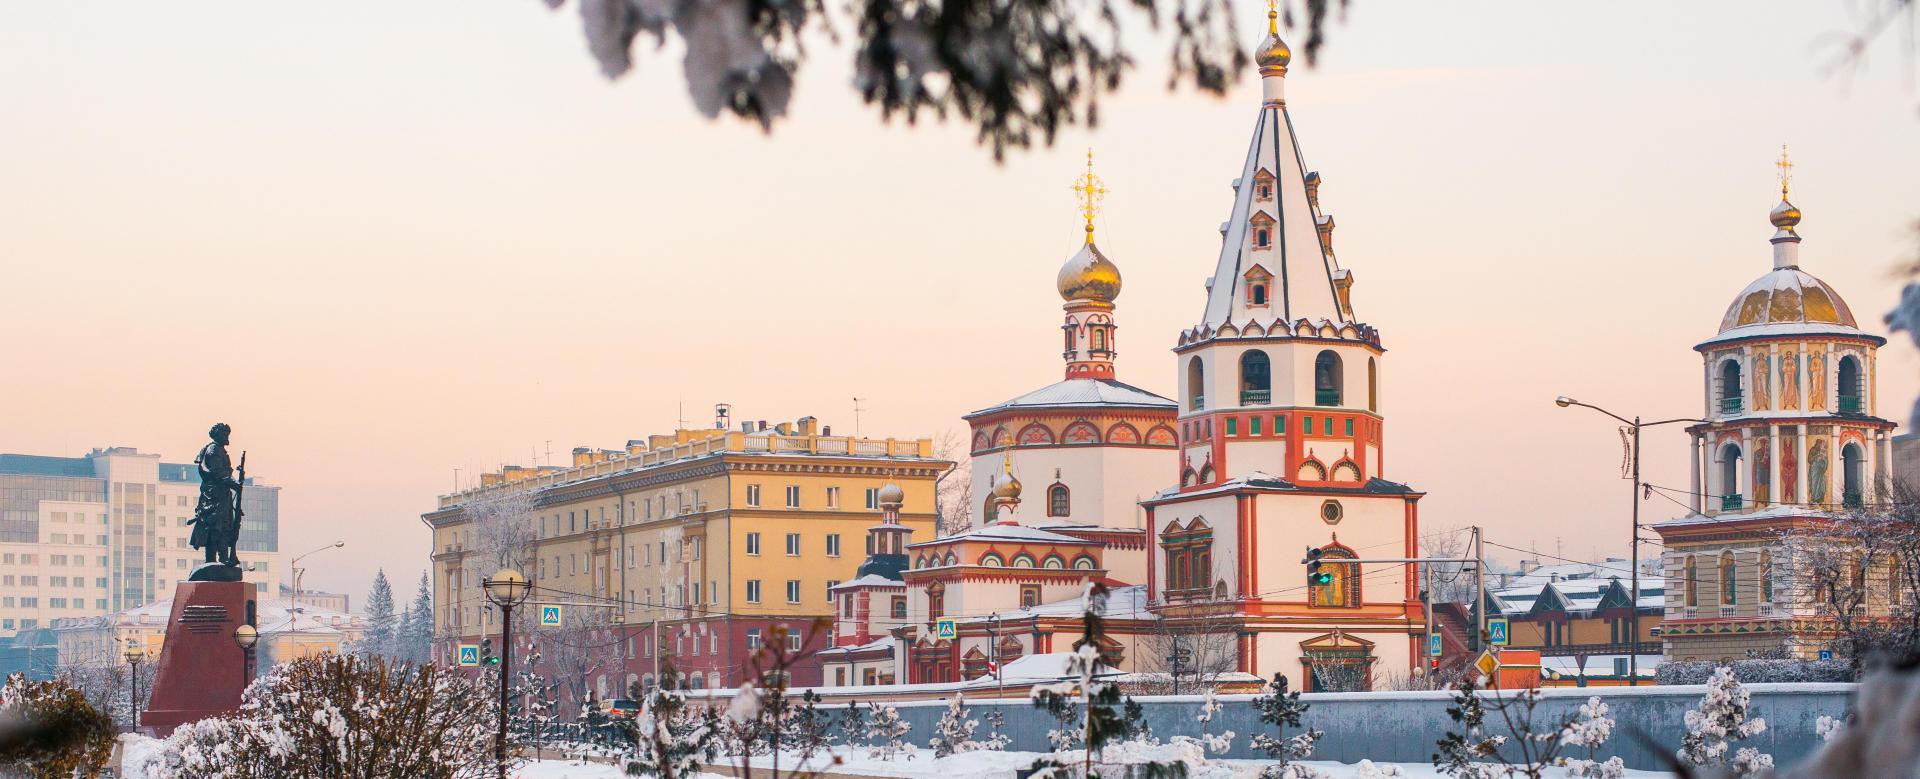 Voyage en véhicule : Transsibérien en hiver: moscou - baikal